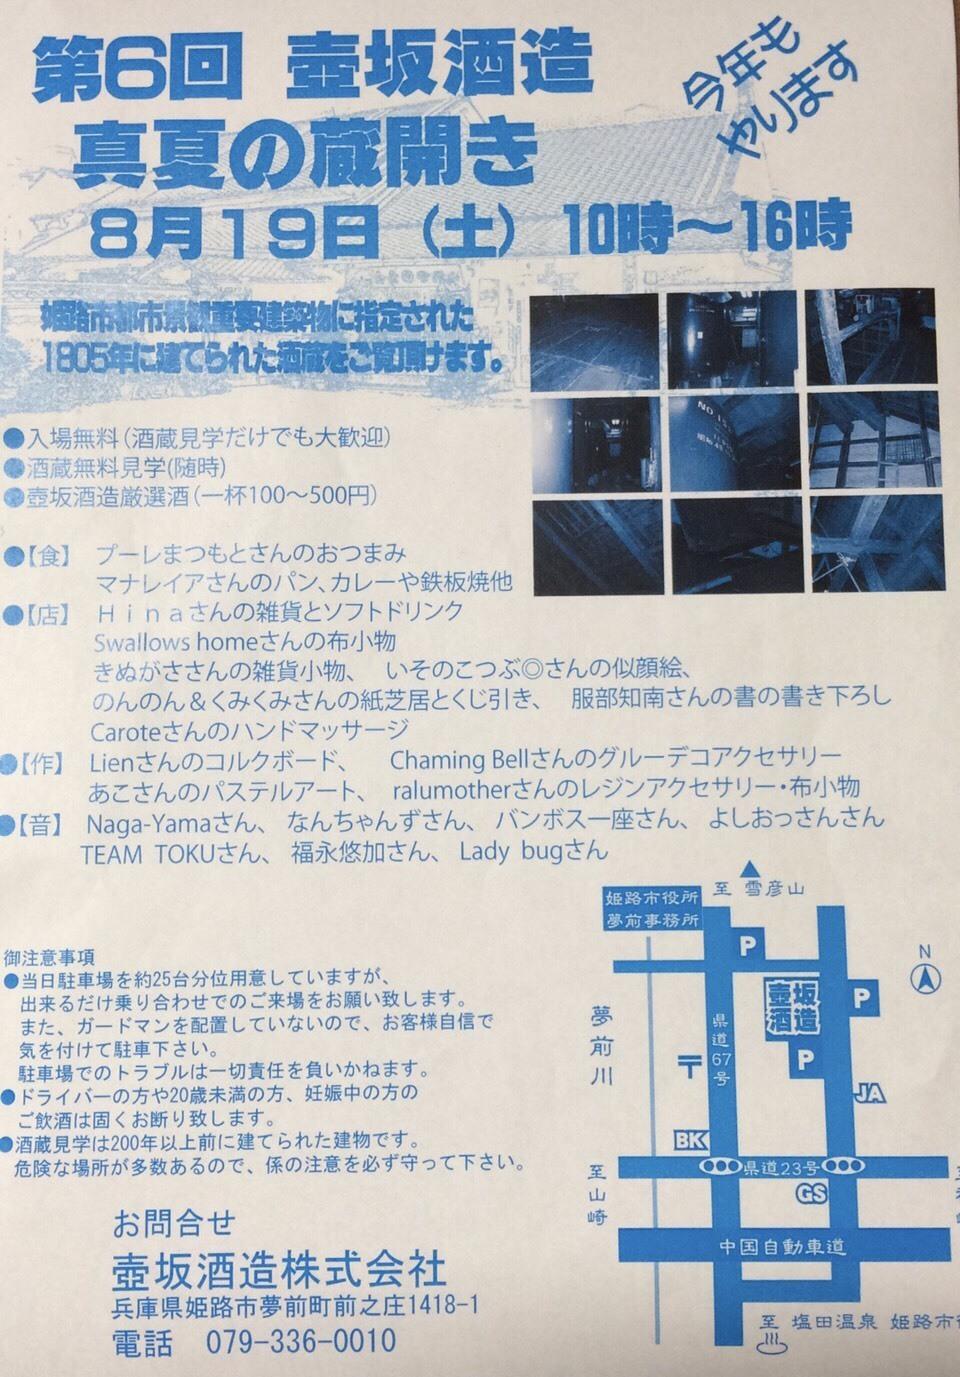 S__26198020.jpg